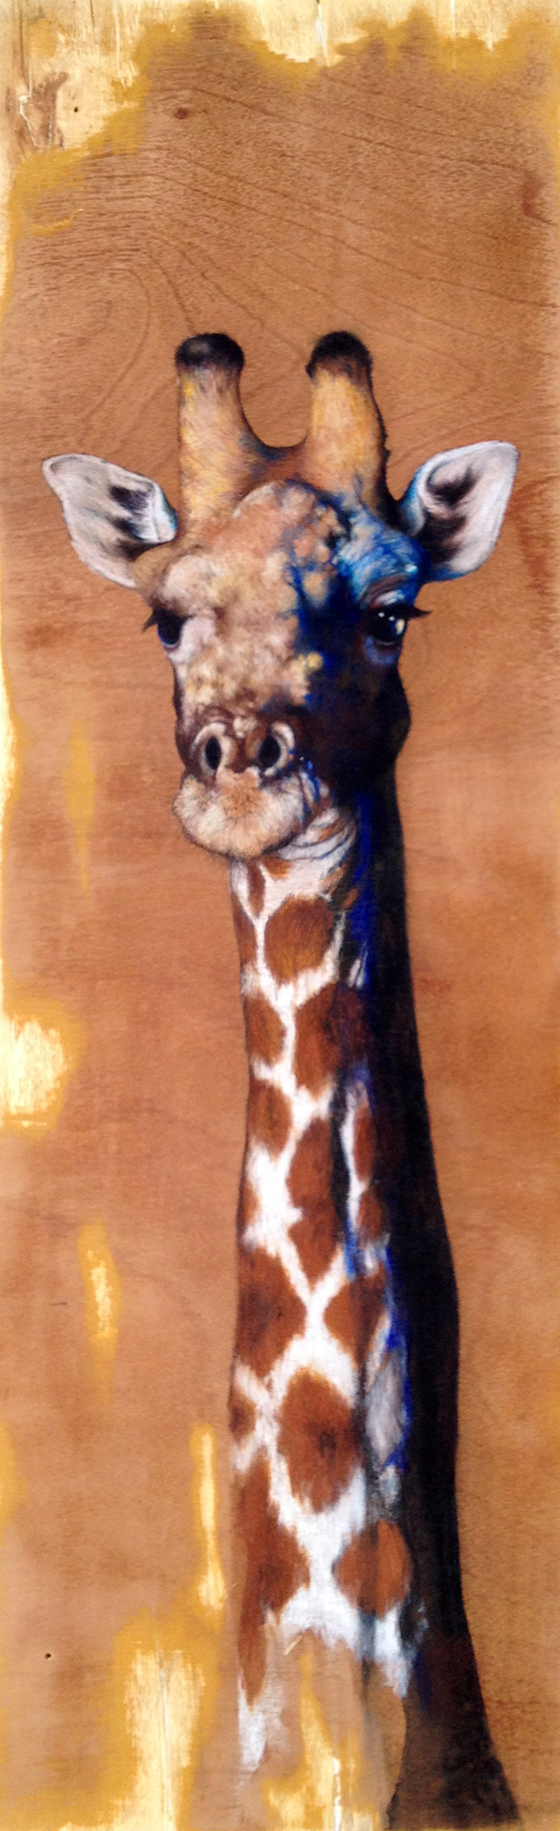 ID426442-Giraffe-Anthony-L-Burks.jpg